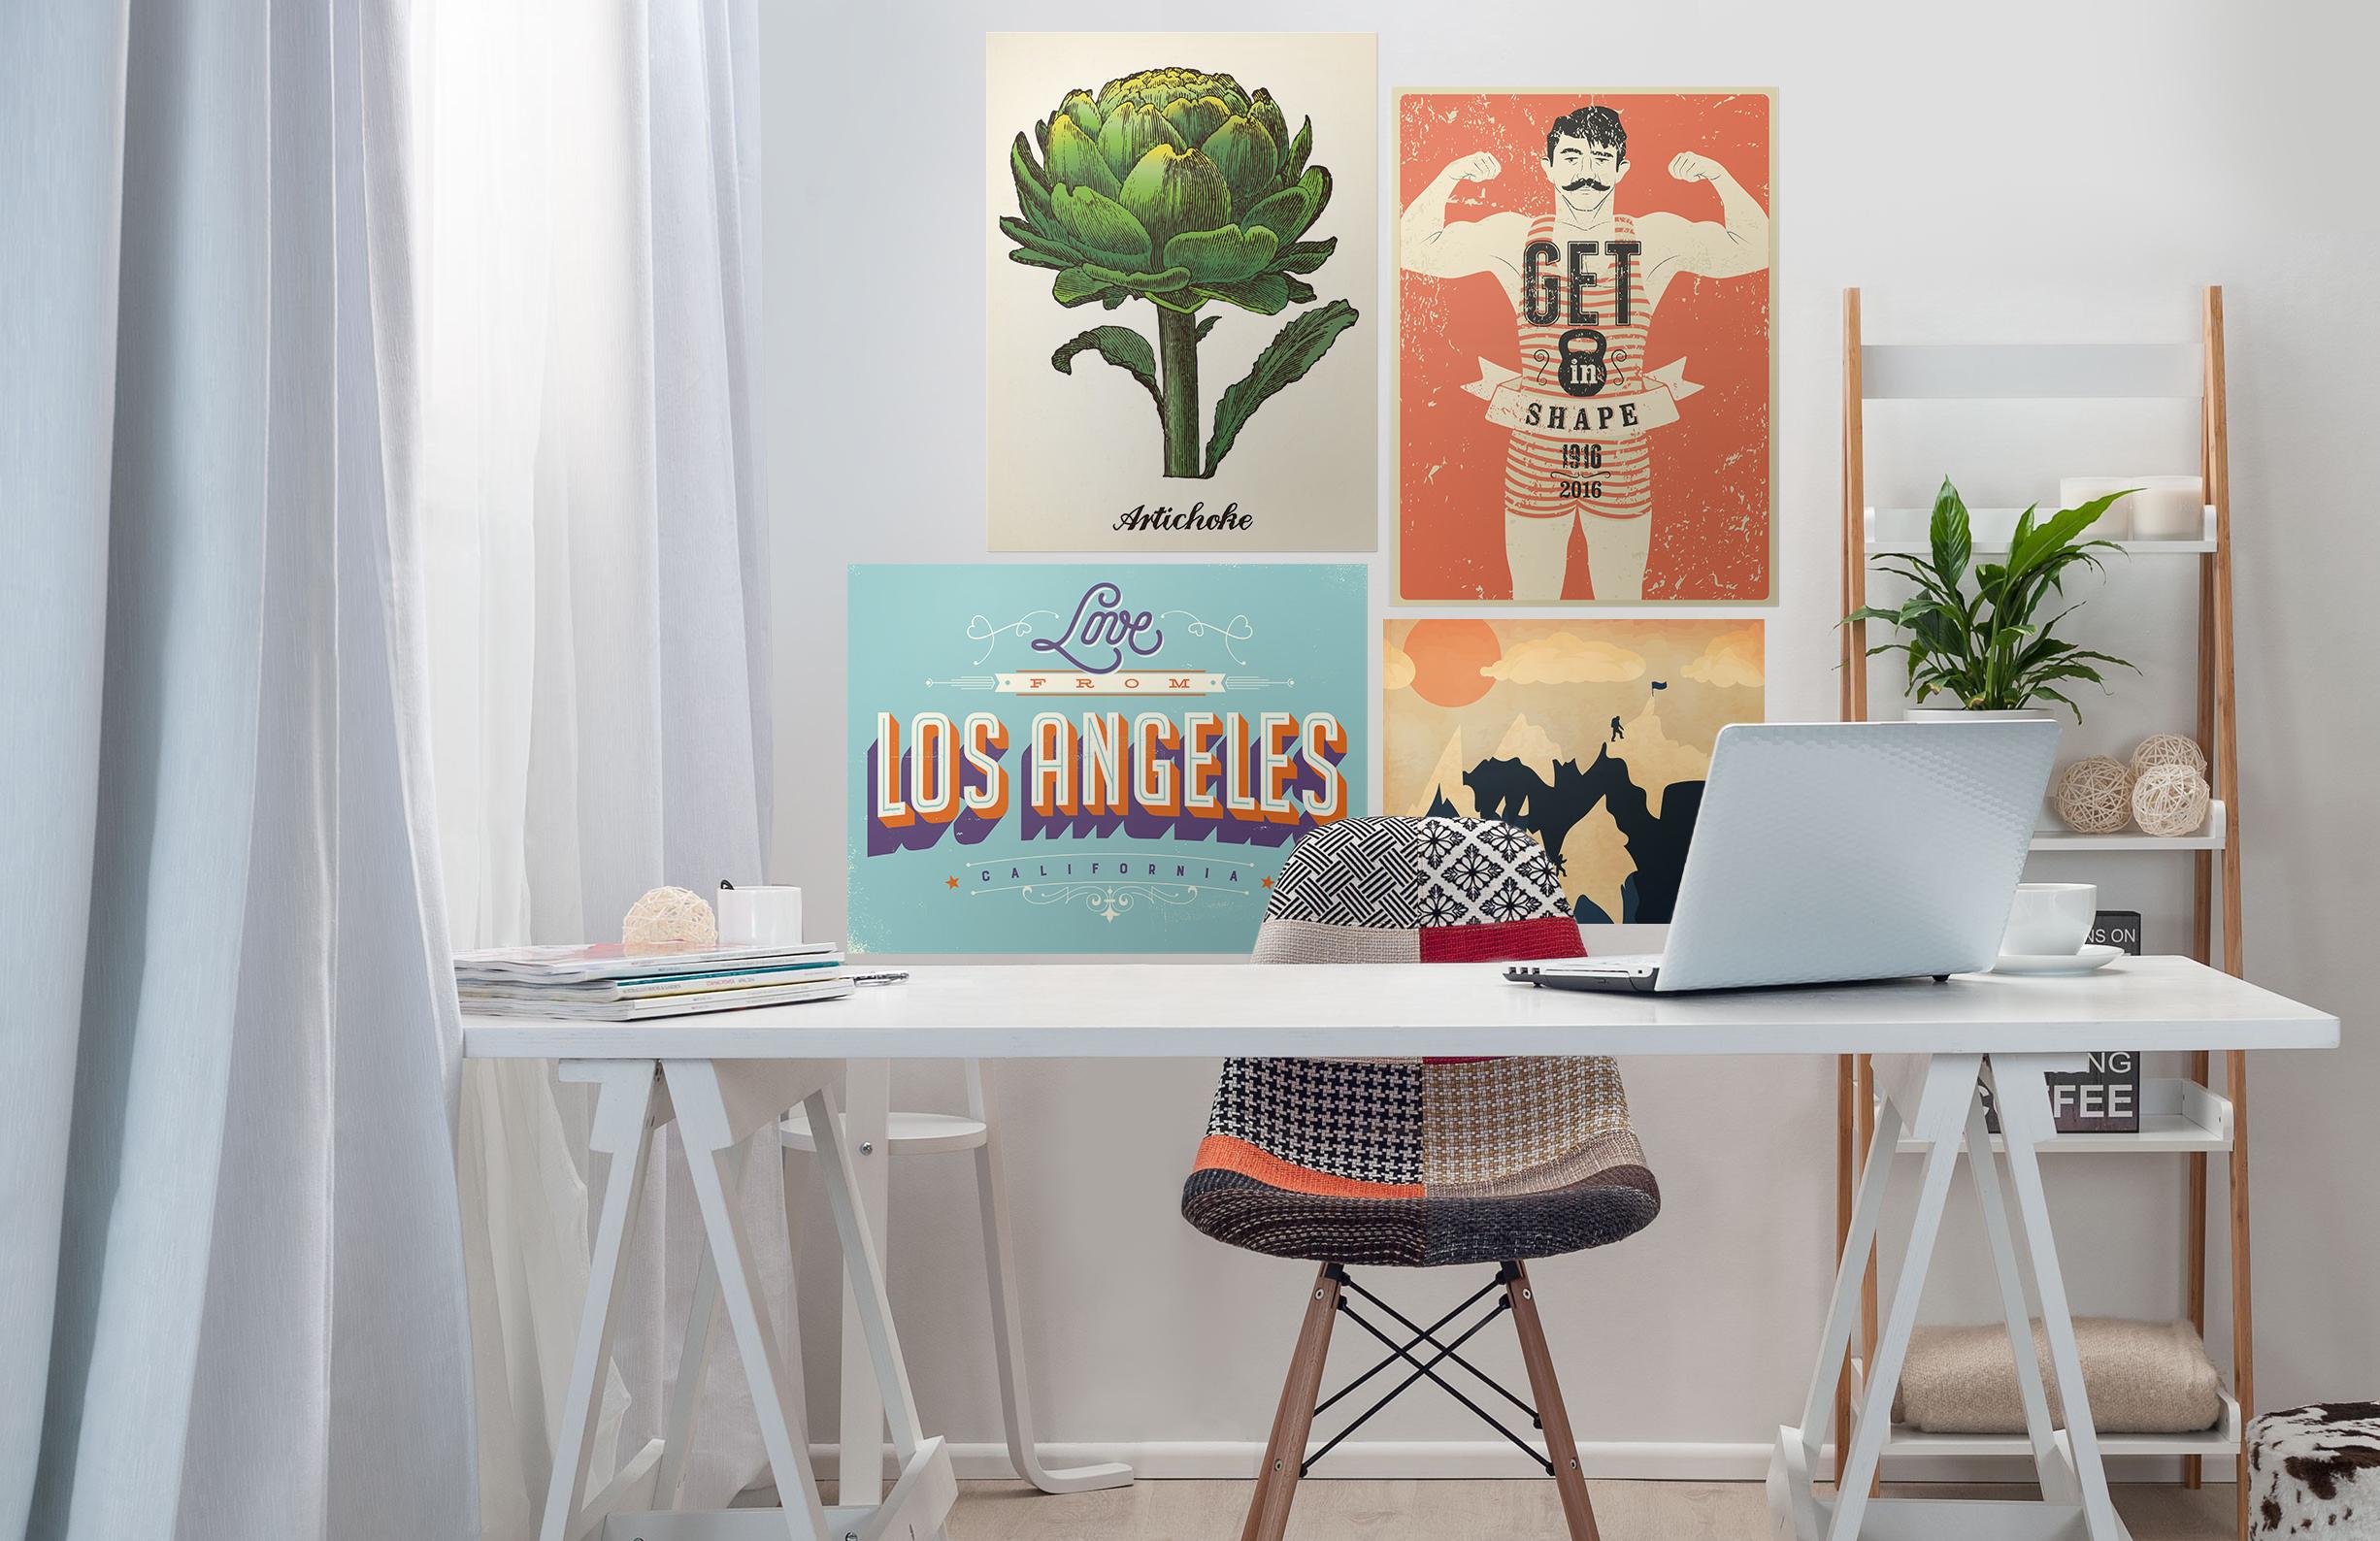 retro poster skandinavisch b ro kunst und lifestyle. Black Bedroom Furniture Sets. Home Design Ideas